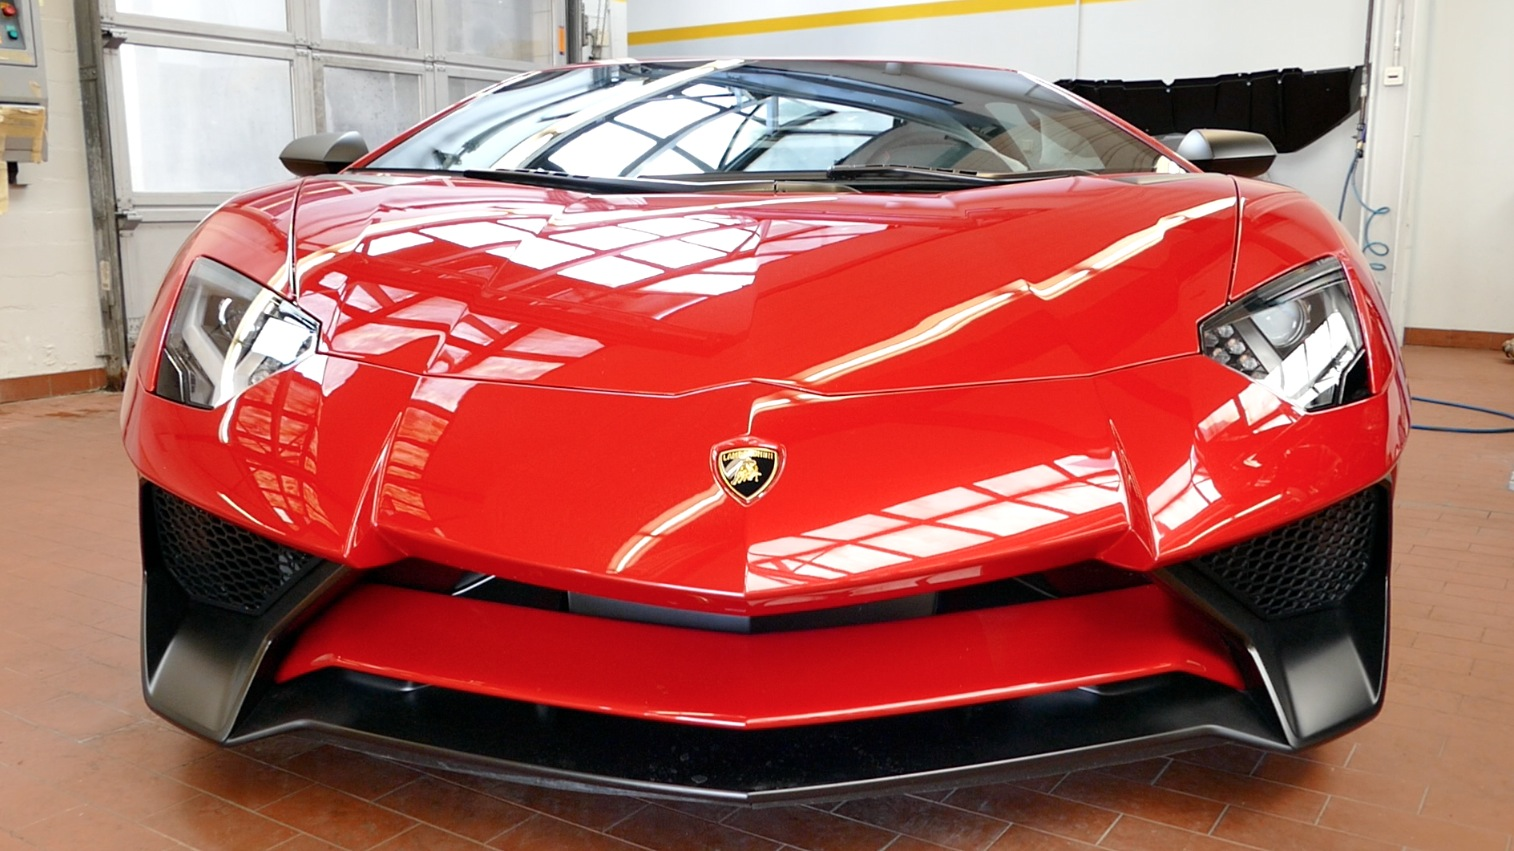 LamborghiniAventador-LP750-4_autogefueh000